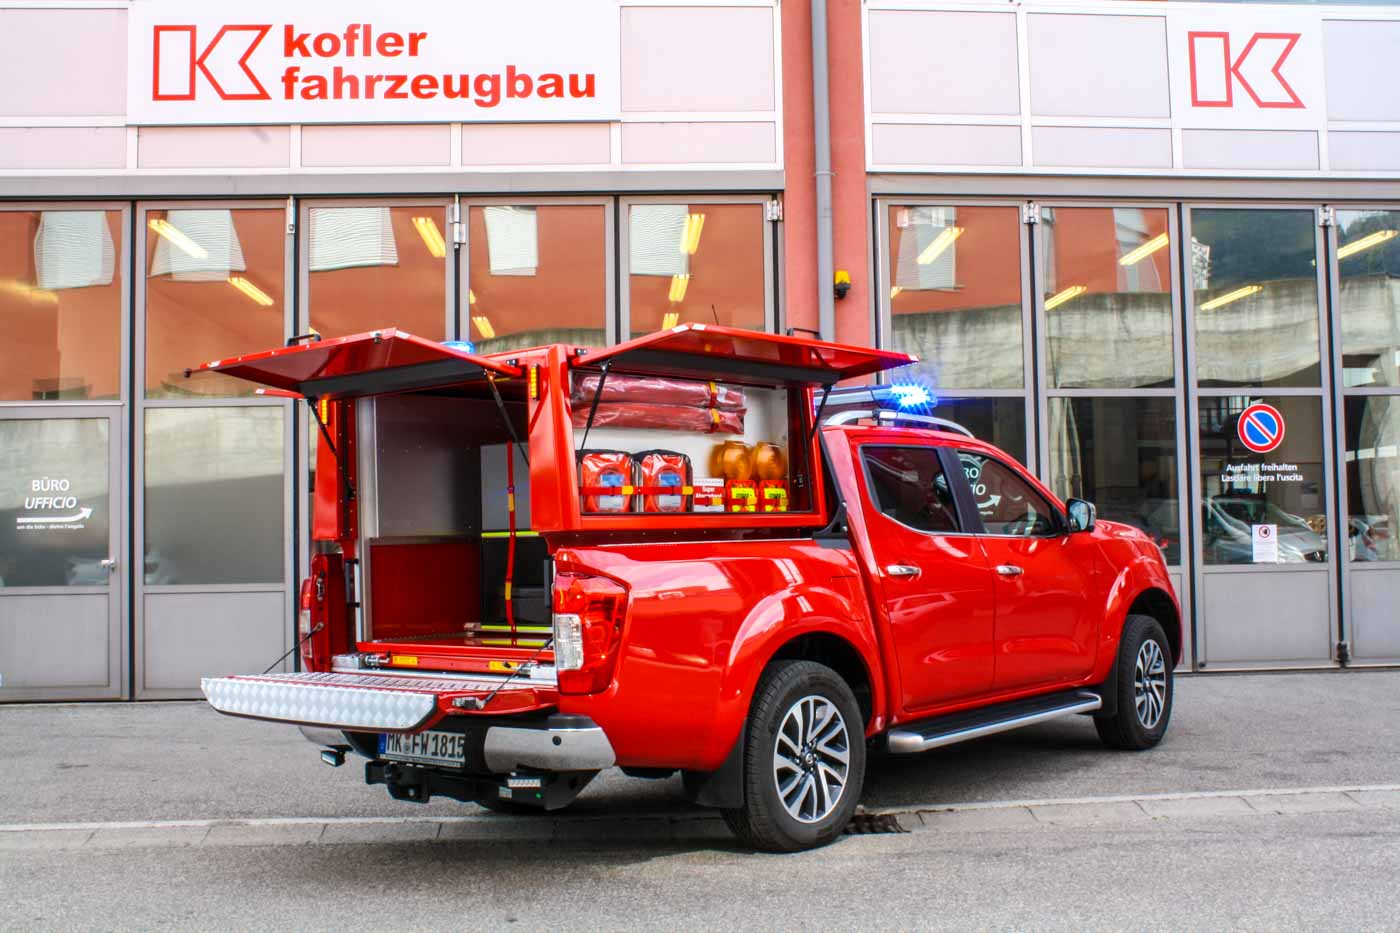 FF-Lüdenscheid-Kofler-Fahrzeugbau